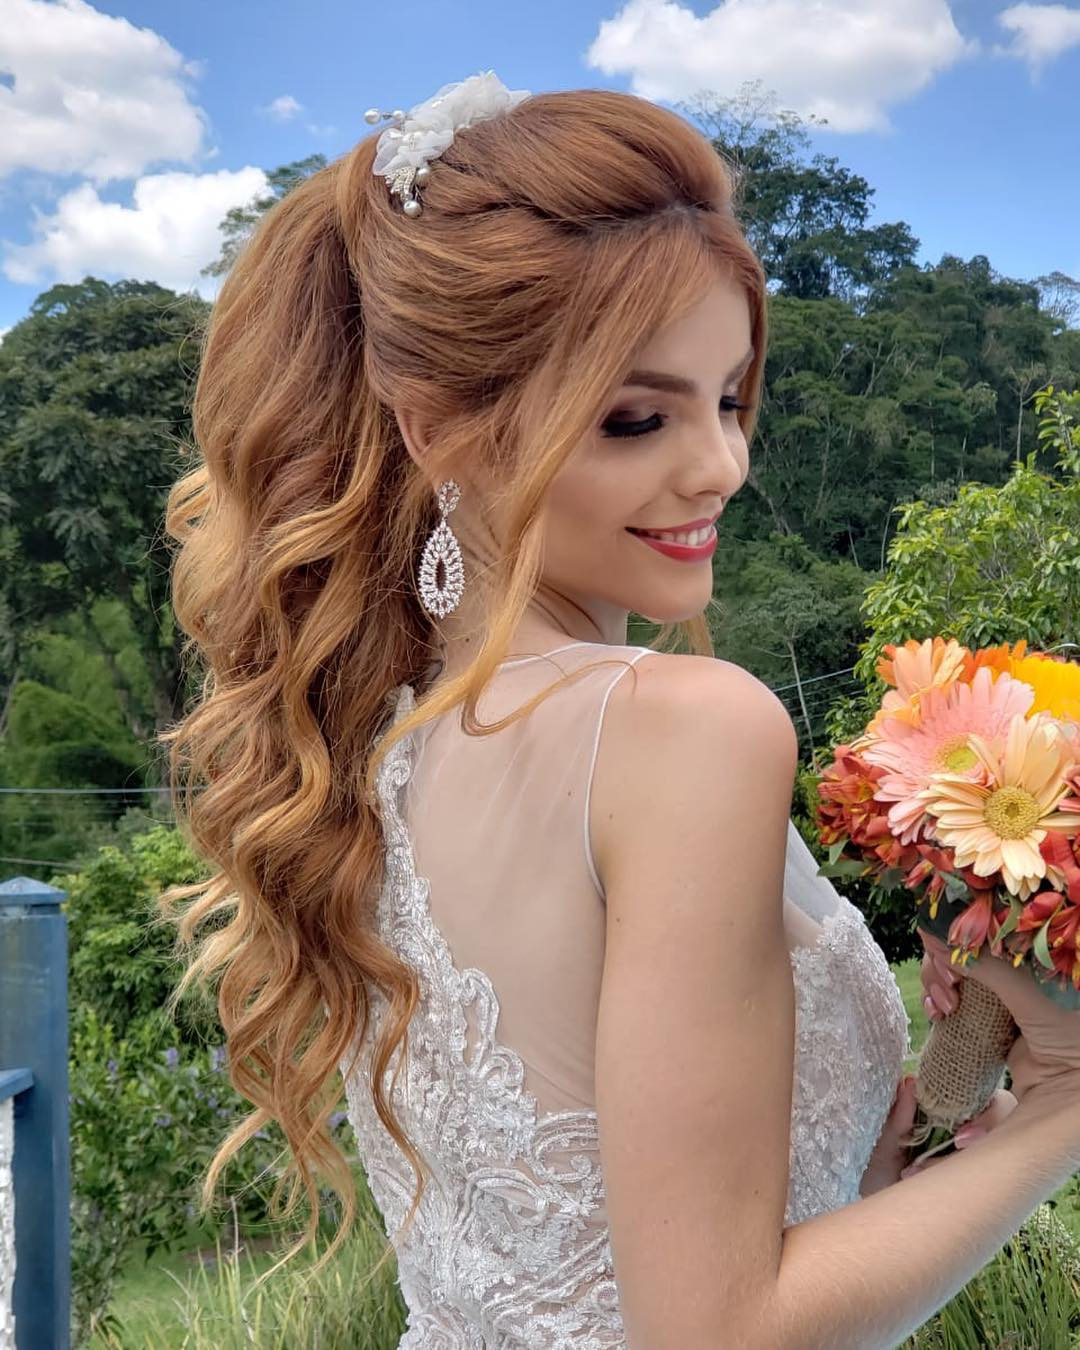 nathalie de oliveira, miss bom jardim 2019/1st runner-up de miss international queen 2016. - Página 9 49797610